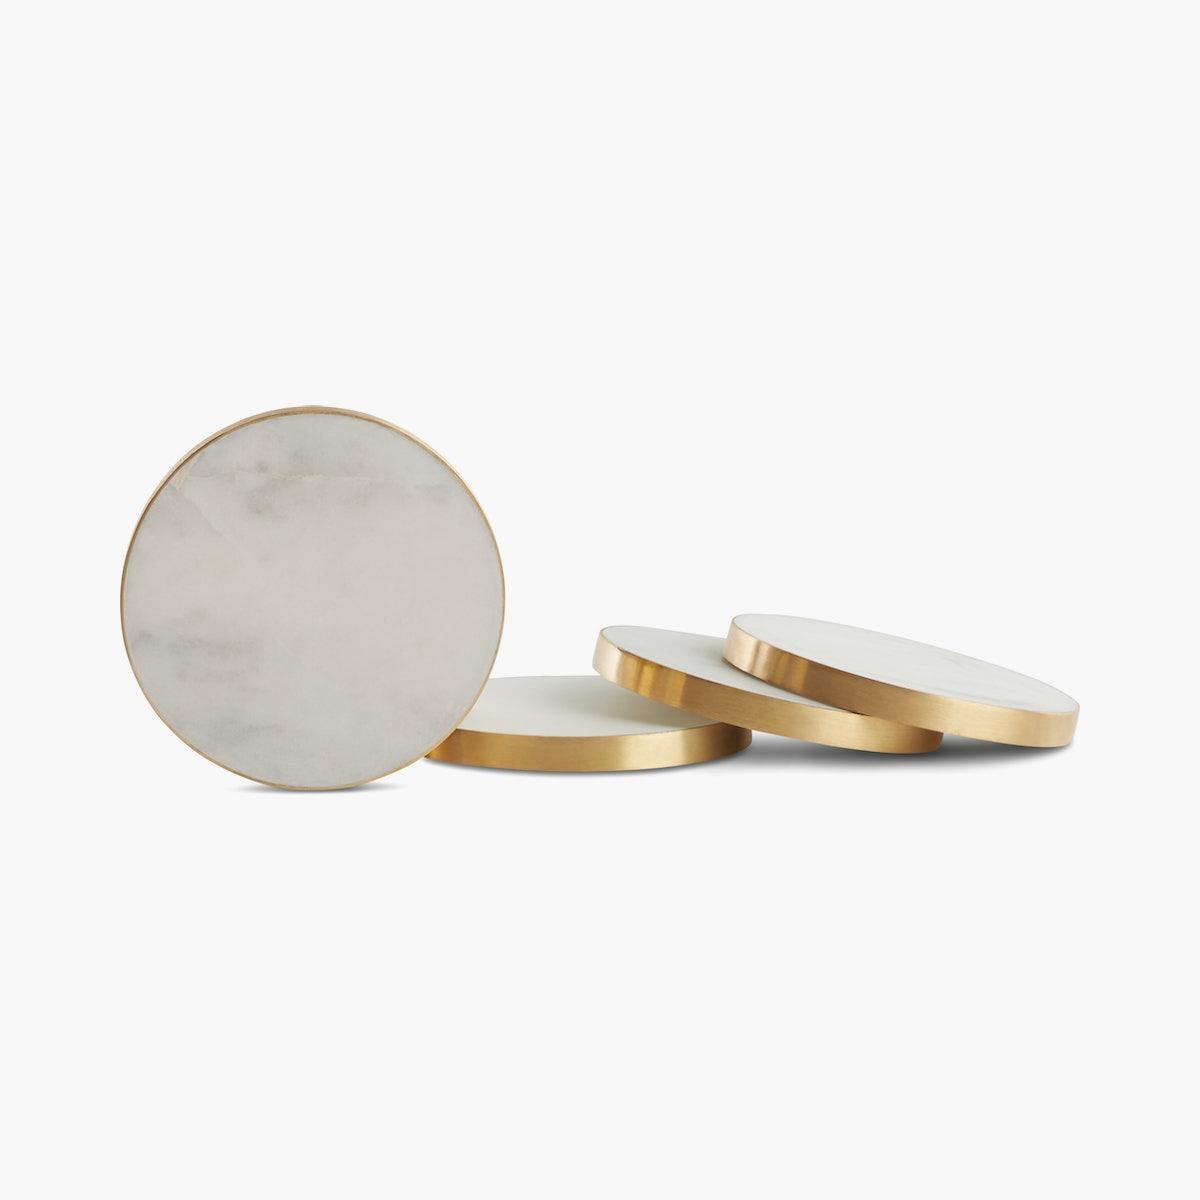 Simple Marble Coasters - Set of 4